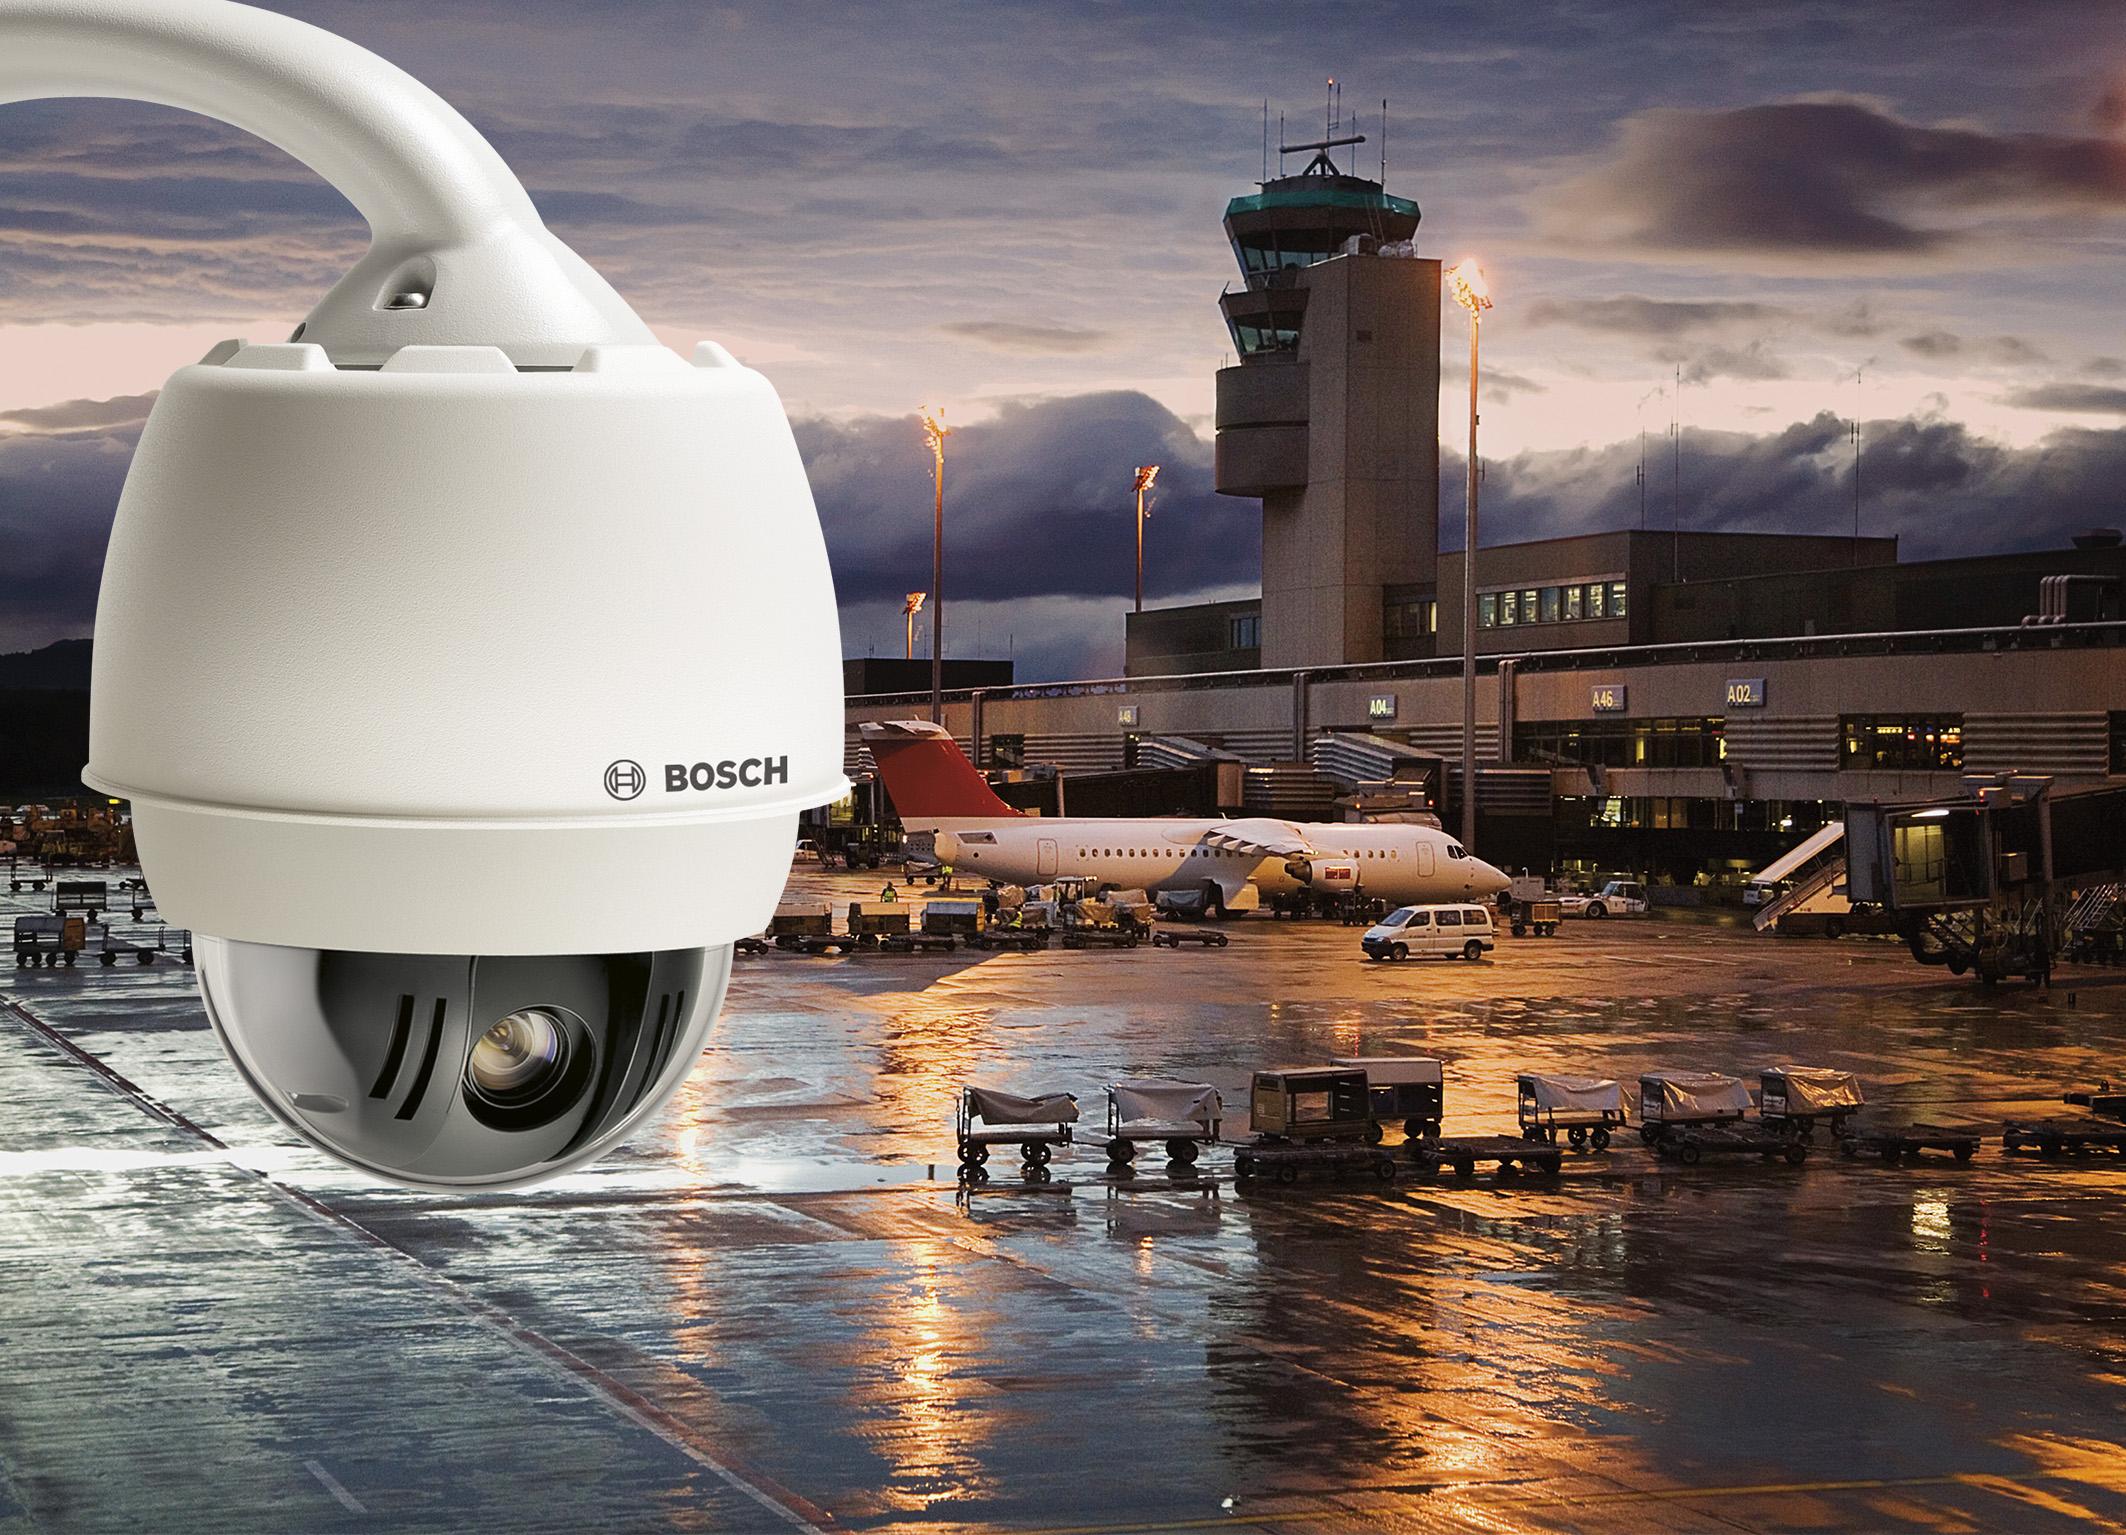 Autodome Ptz Camera Wiring Diagram Not Lossing Security Bosch Ip Starlight 7000 Hd 720p 30x Rh A2zsecuritycameras Com Surveillance Swann